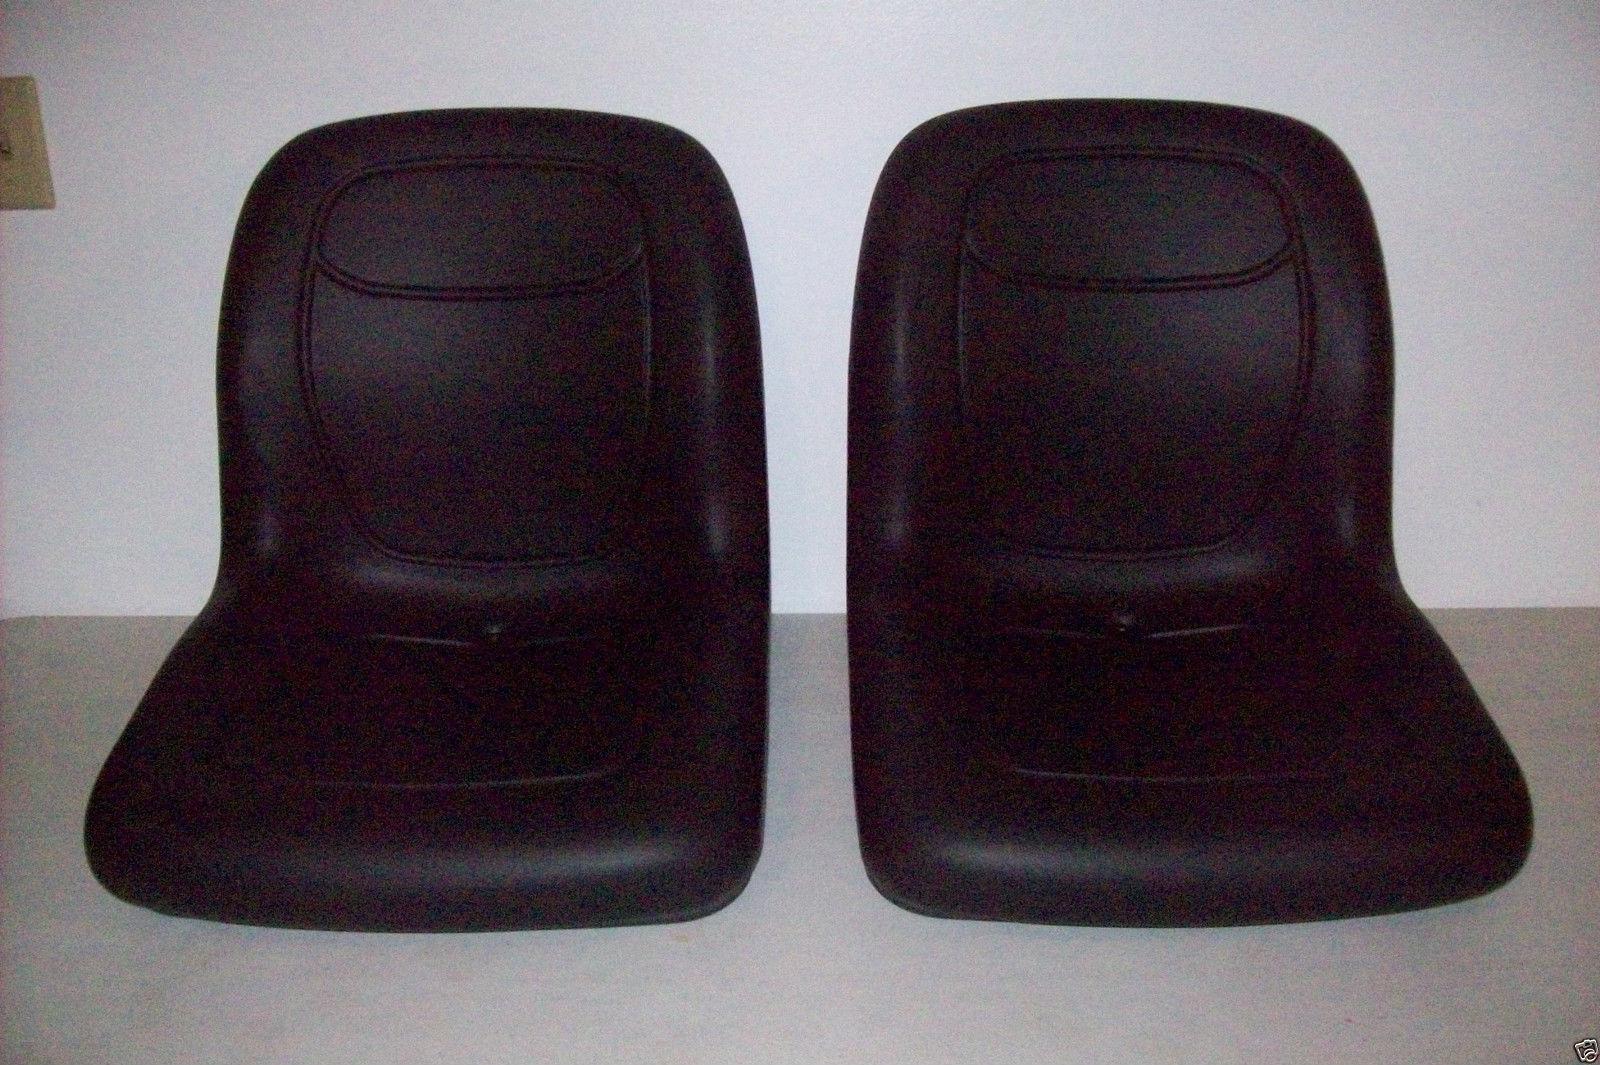 BLACK HIGH BACK SEATS JOHN DEERE TRAIL GATOR GAS DIESEL 4X2 4X4 HPX 6X4 #GI 2